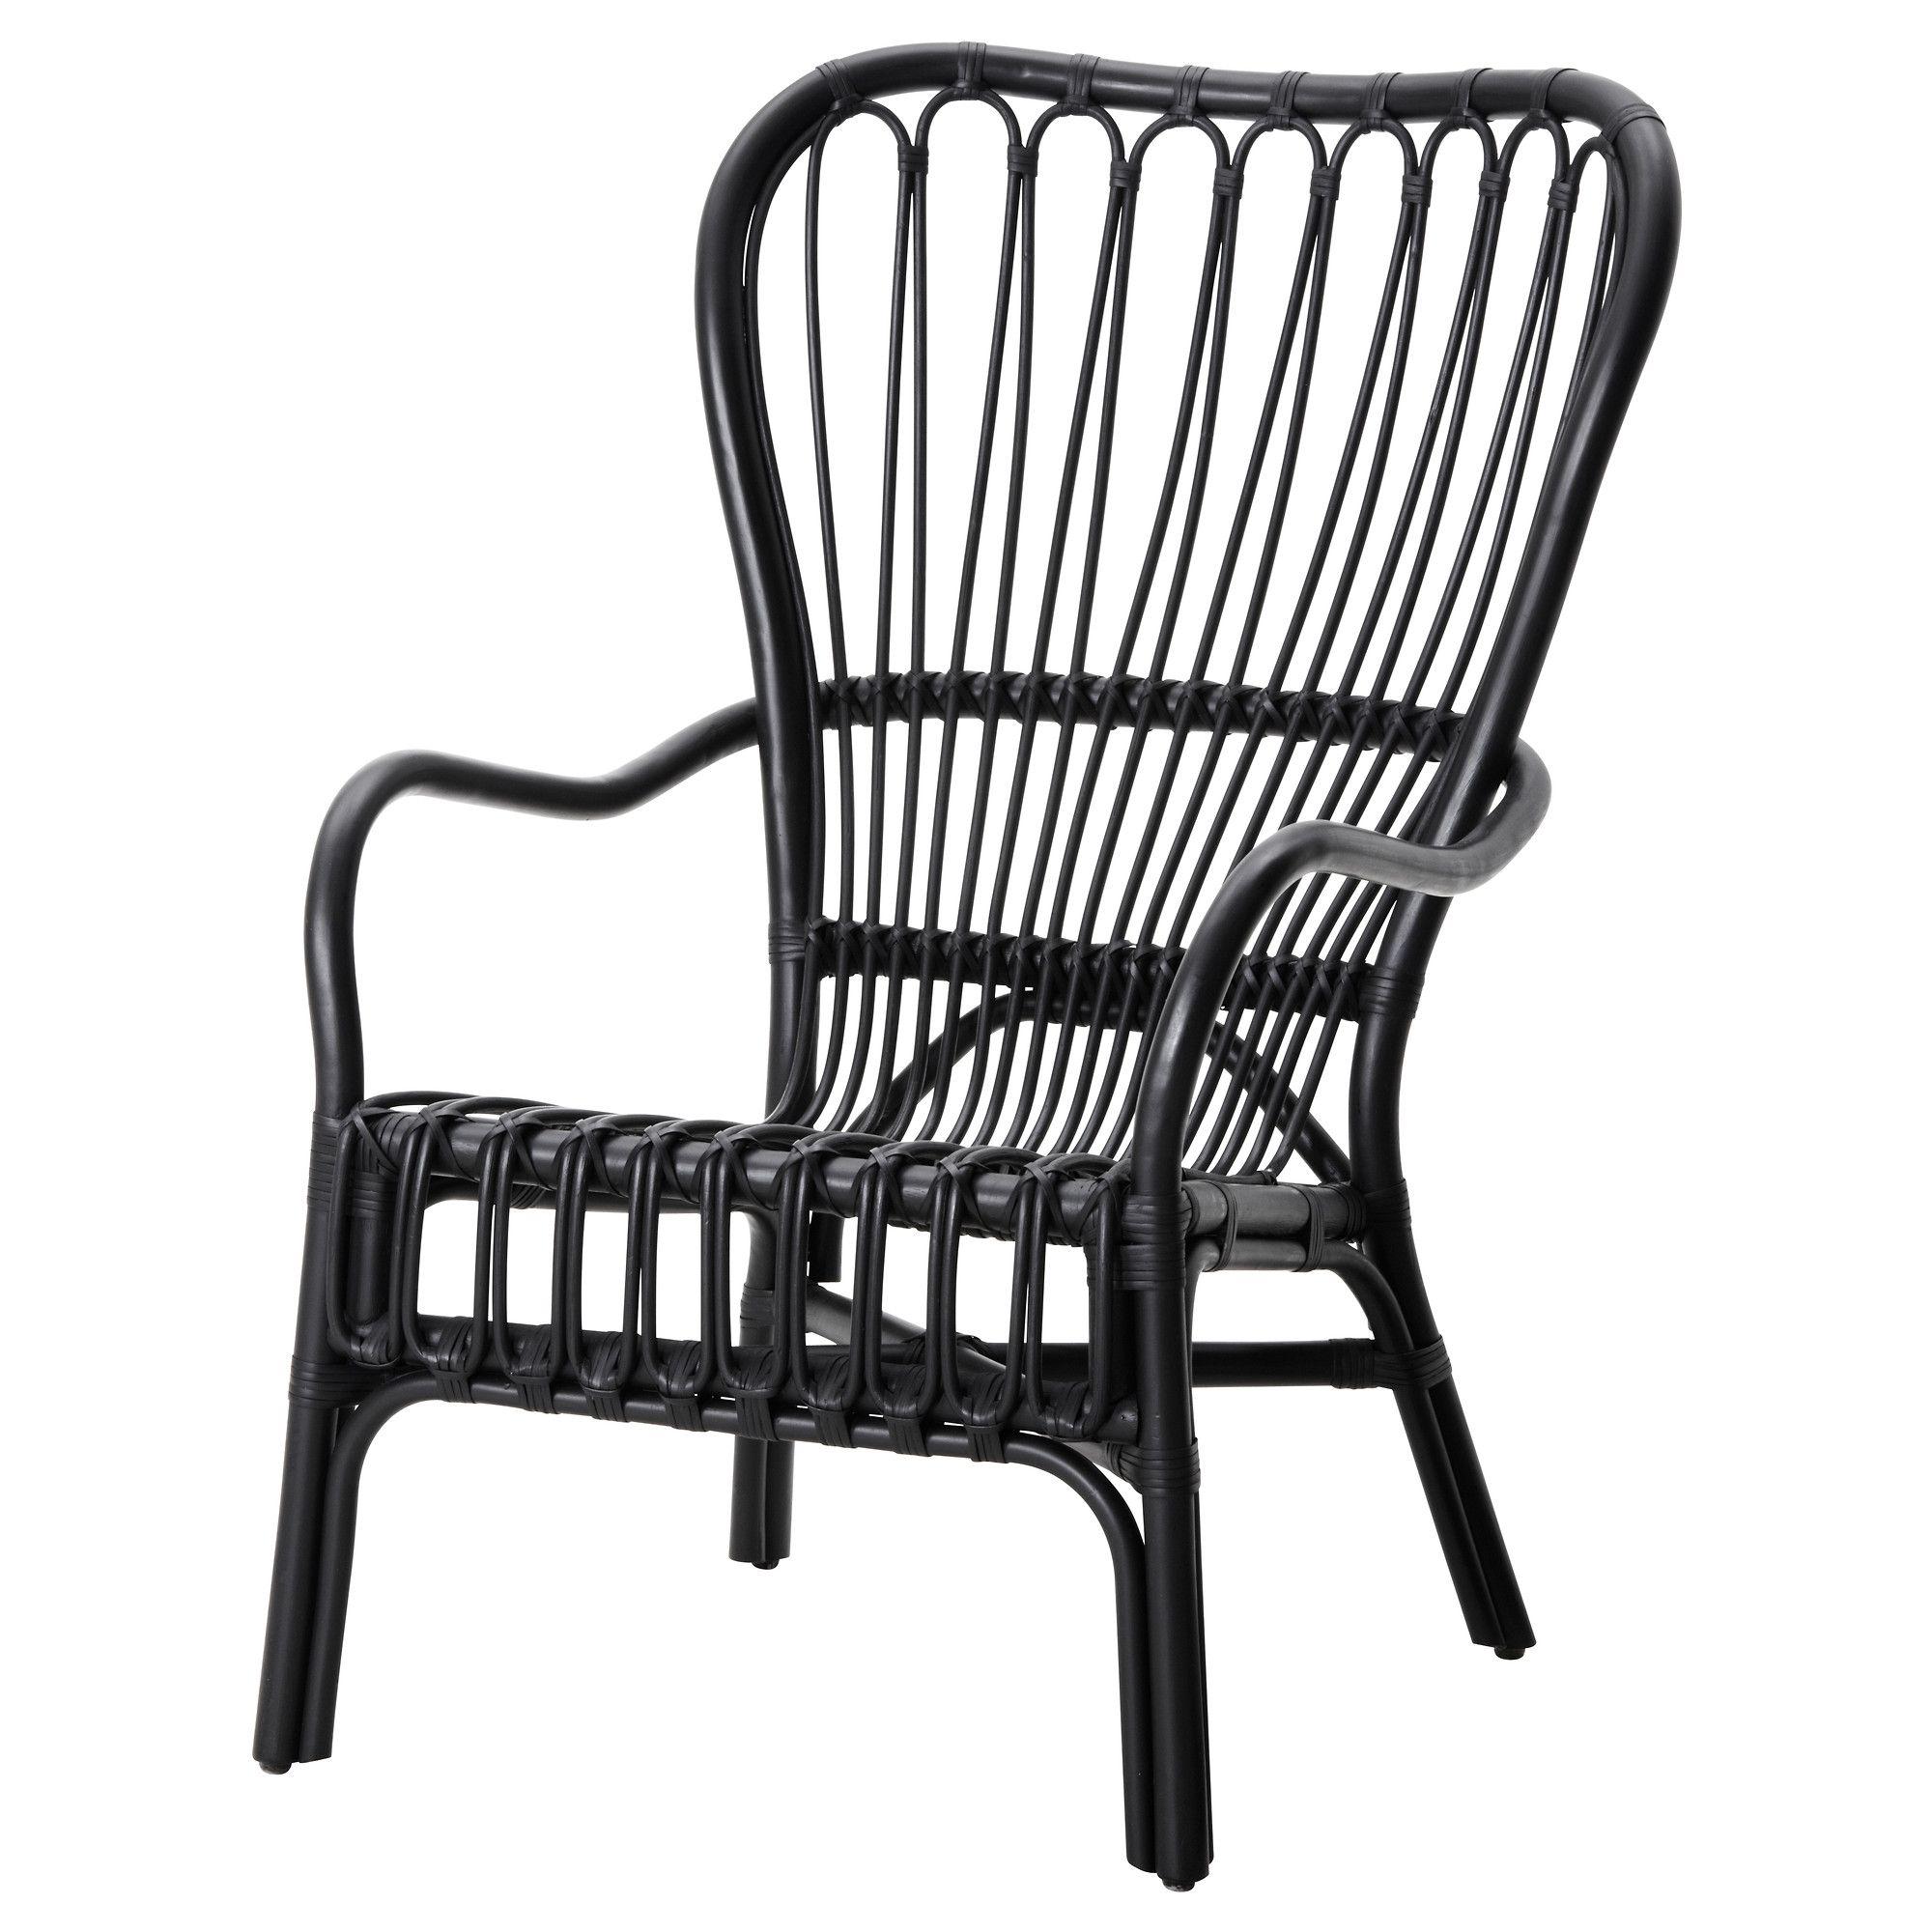 storsele armchair, black, rattan | armchairs, rattan and porch